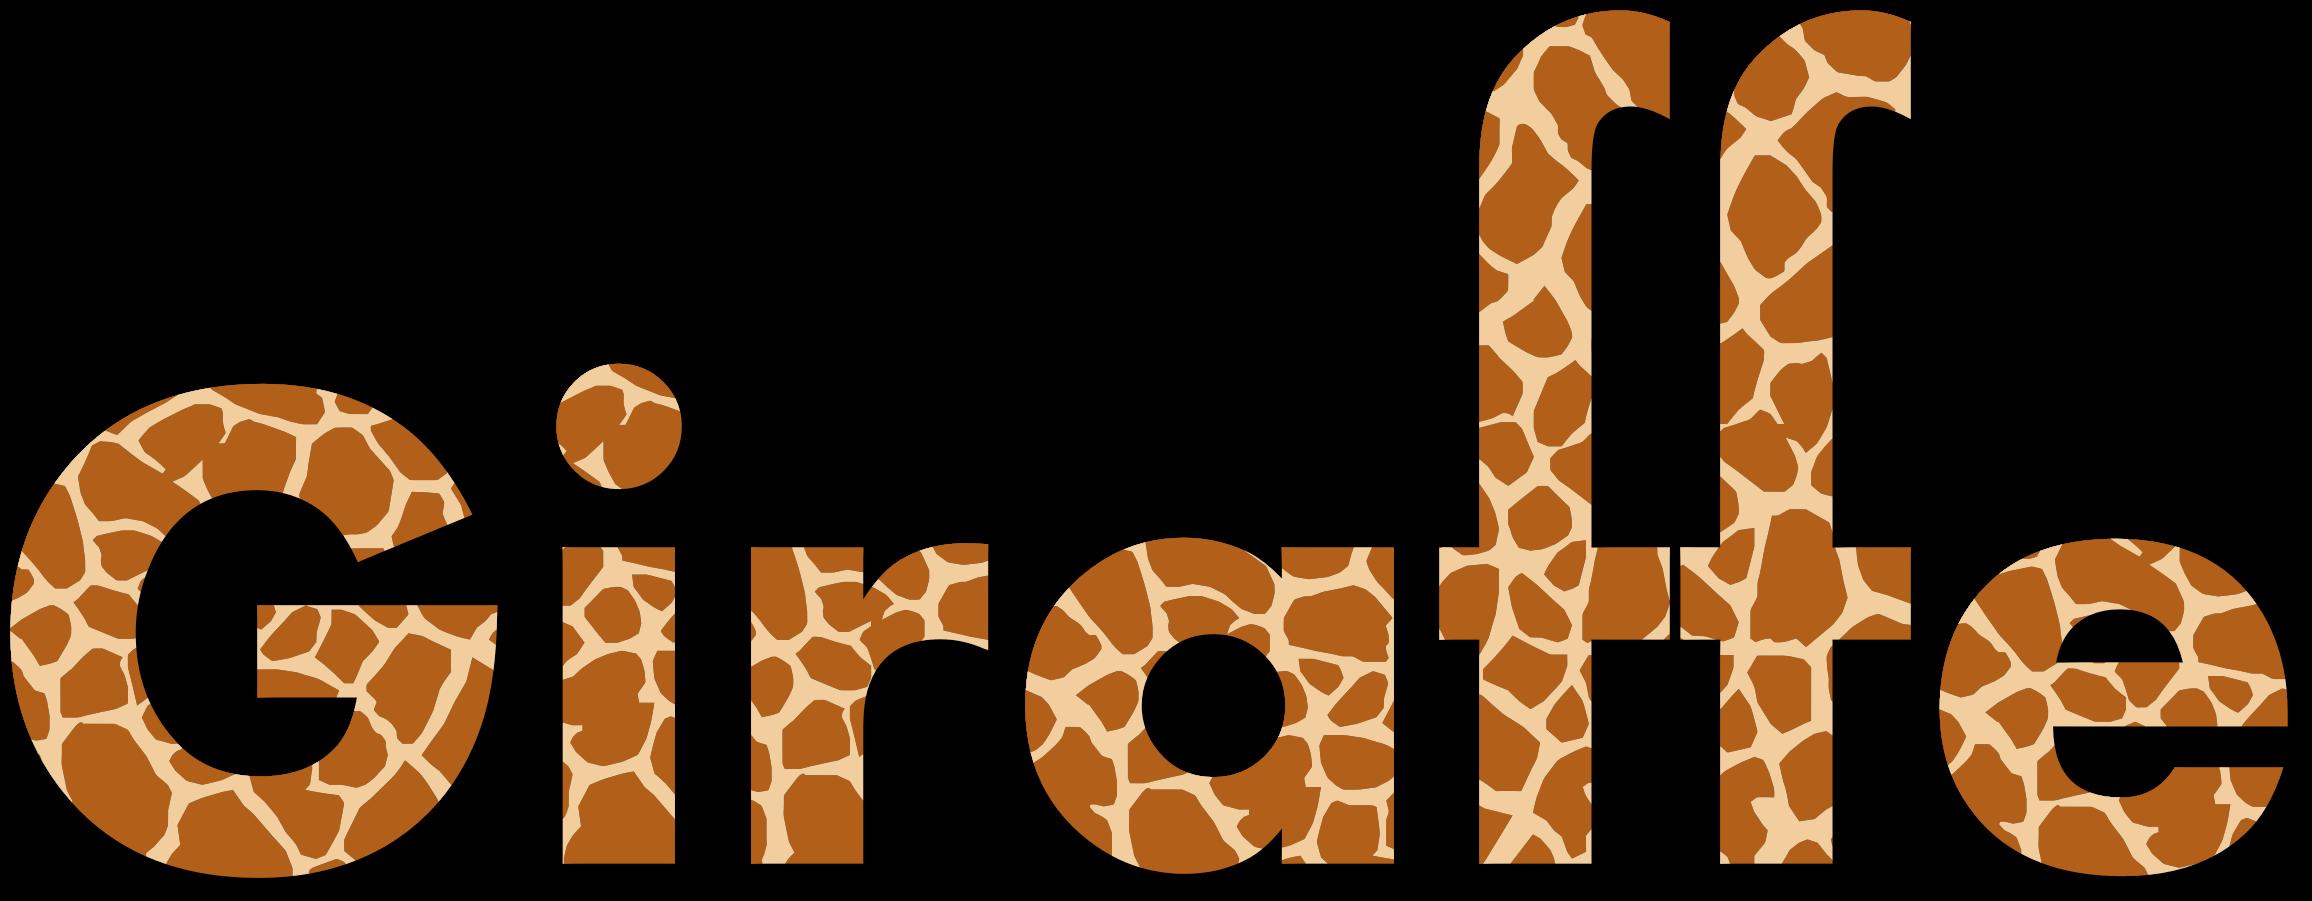 Giraffe clipart shadow. Typography with drop big